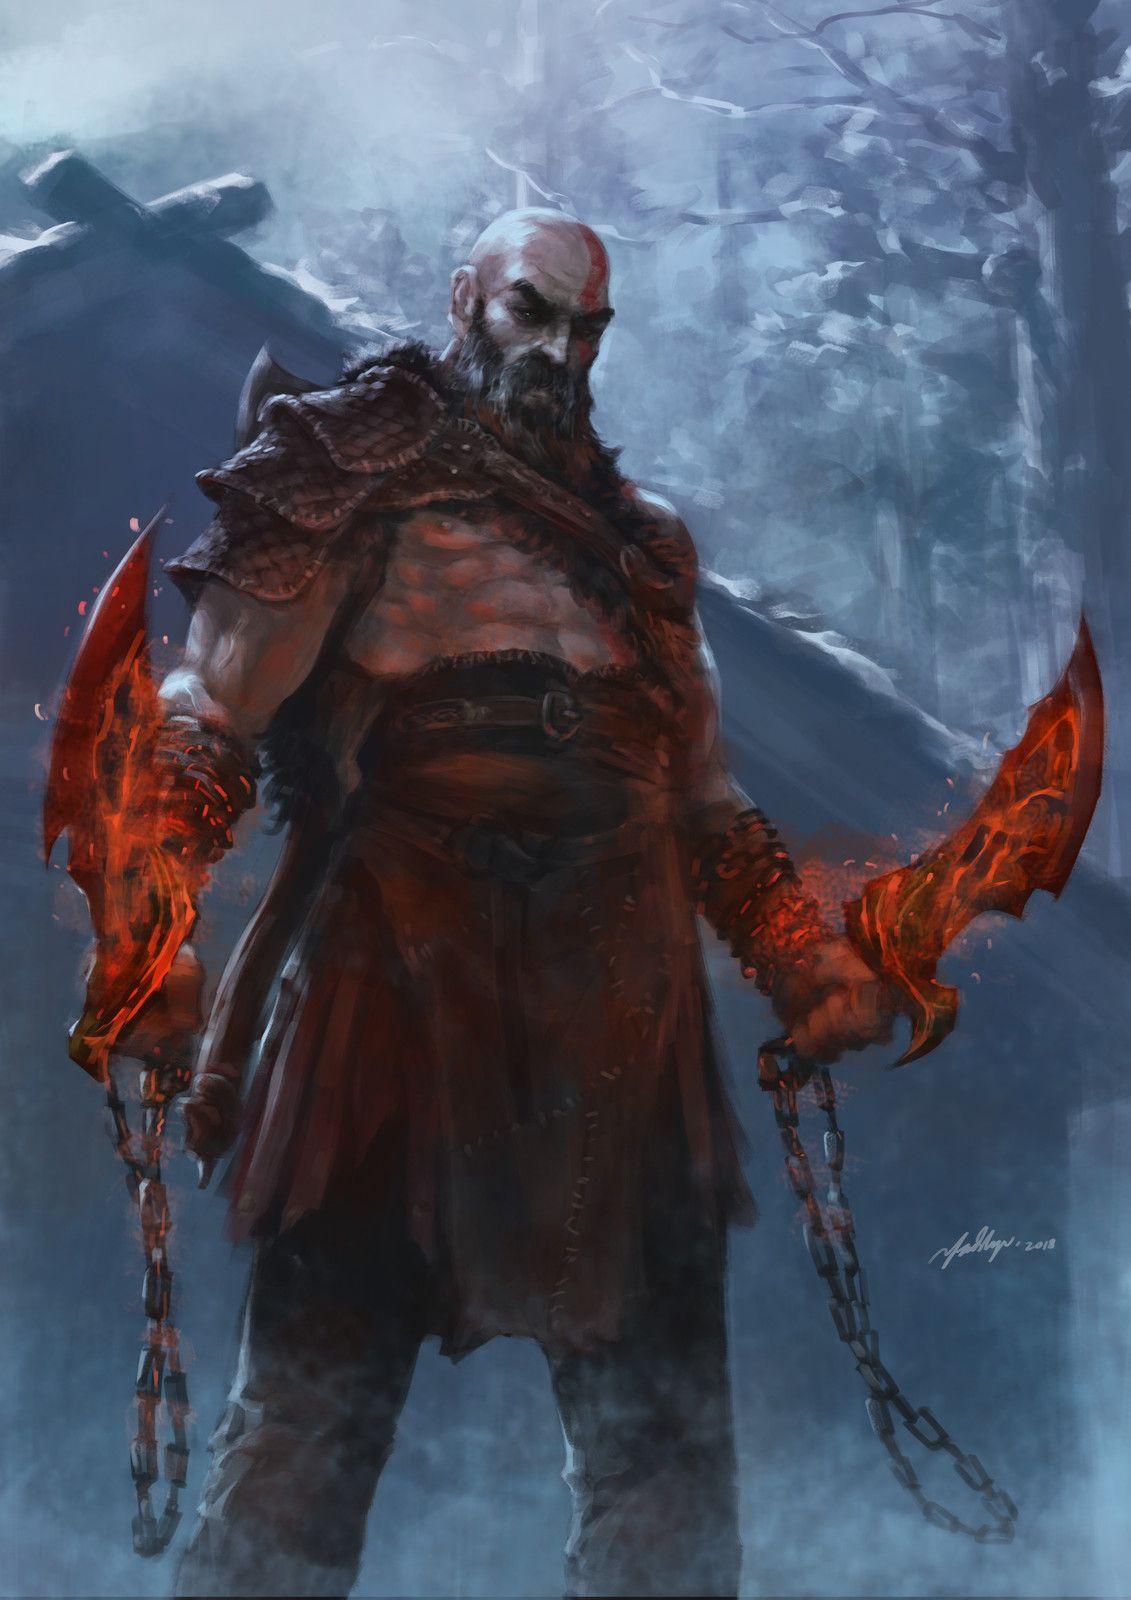 Hello Old Friend Fadly Romdhani On Artstation At Https Www Artstation Com Artwork Brovk God Of War Kratos God Of War God Of War Series